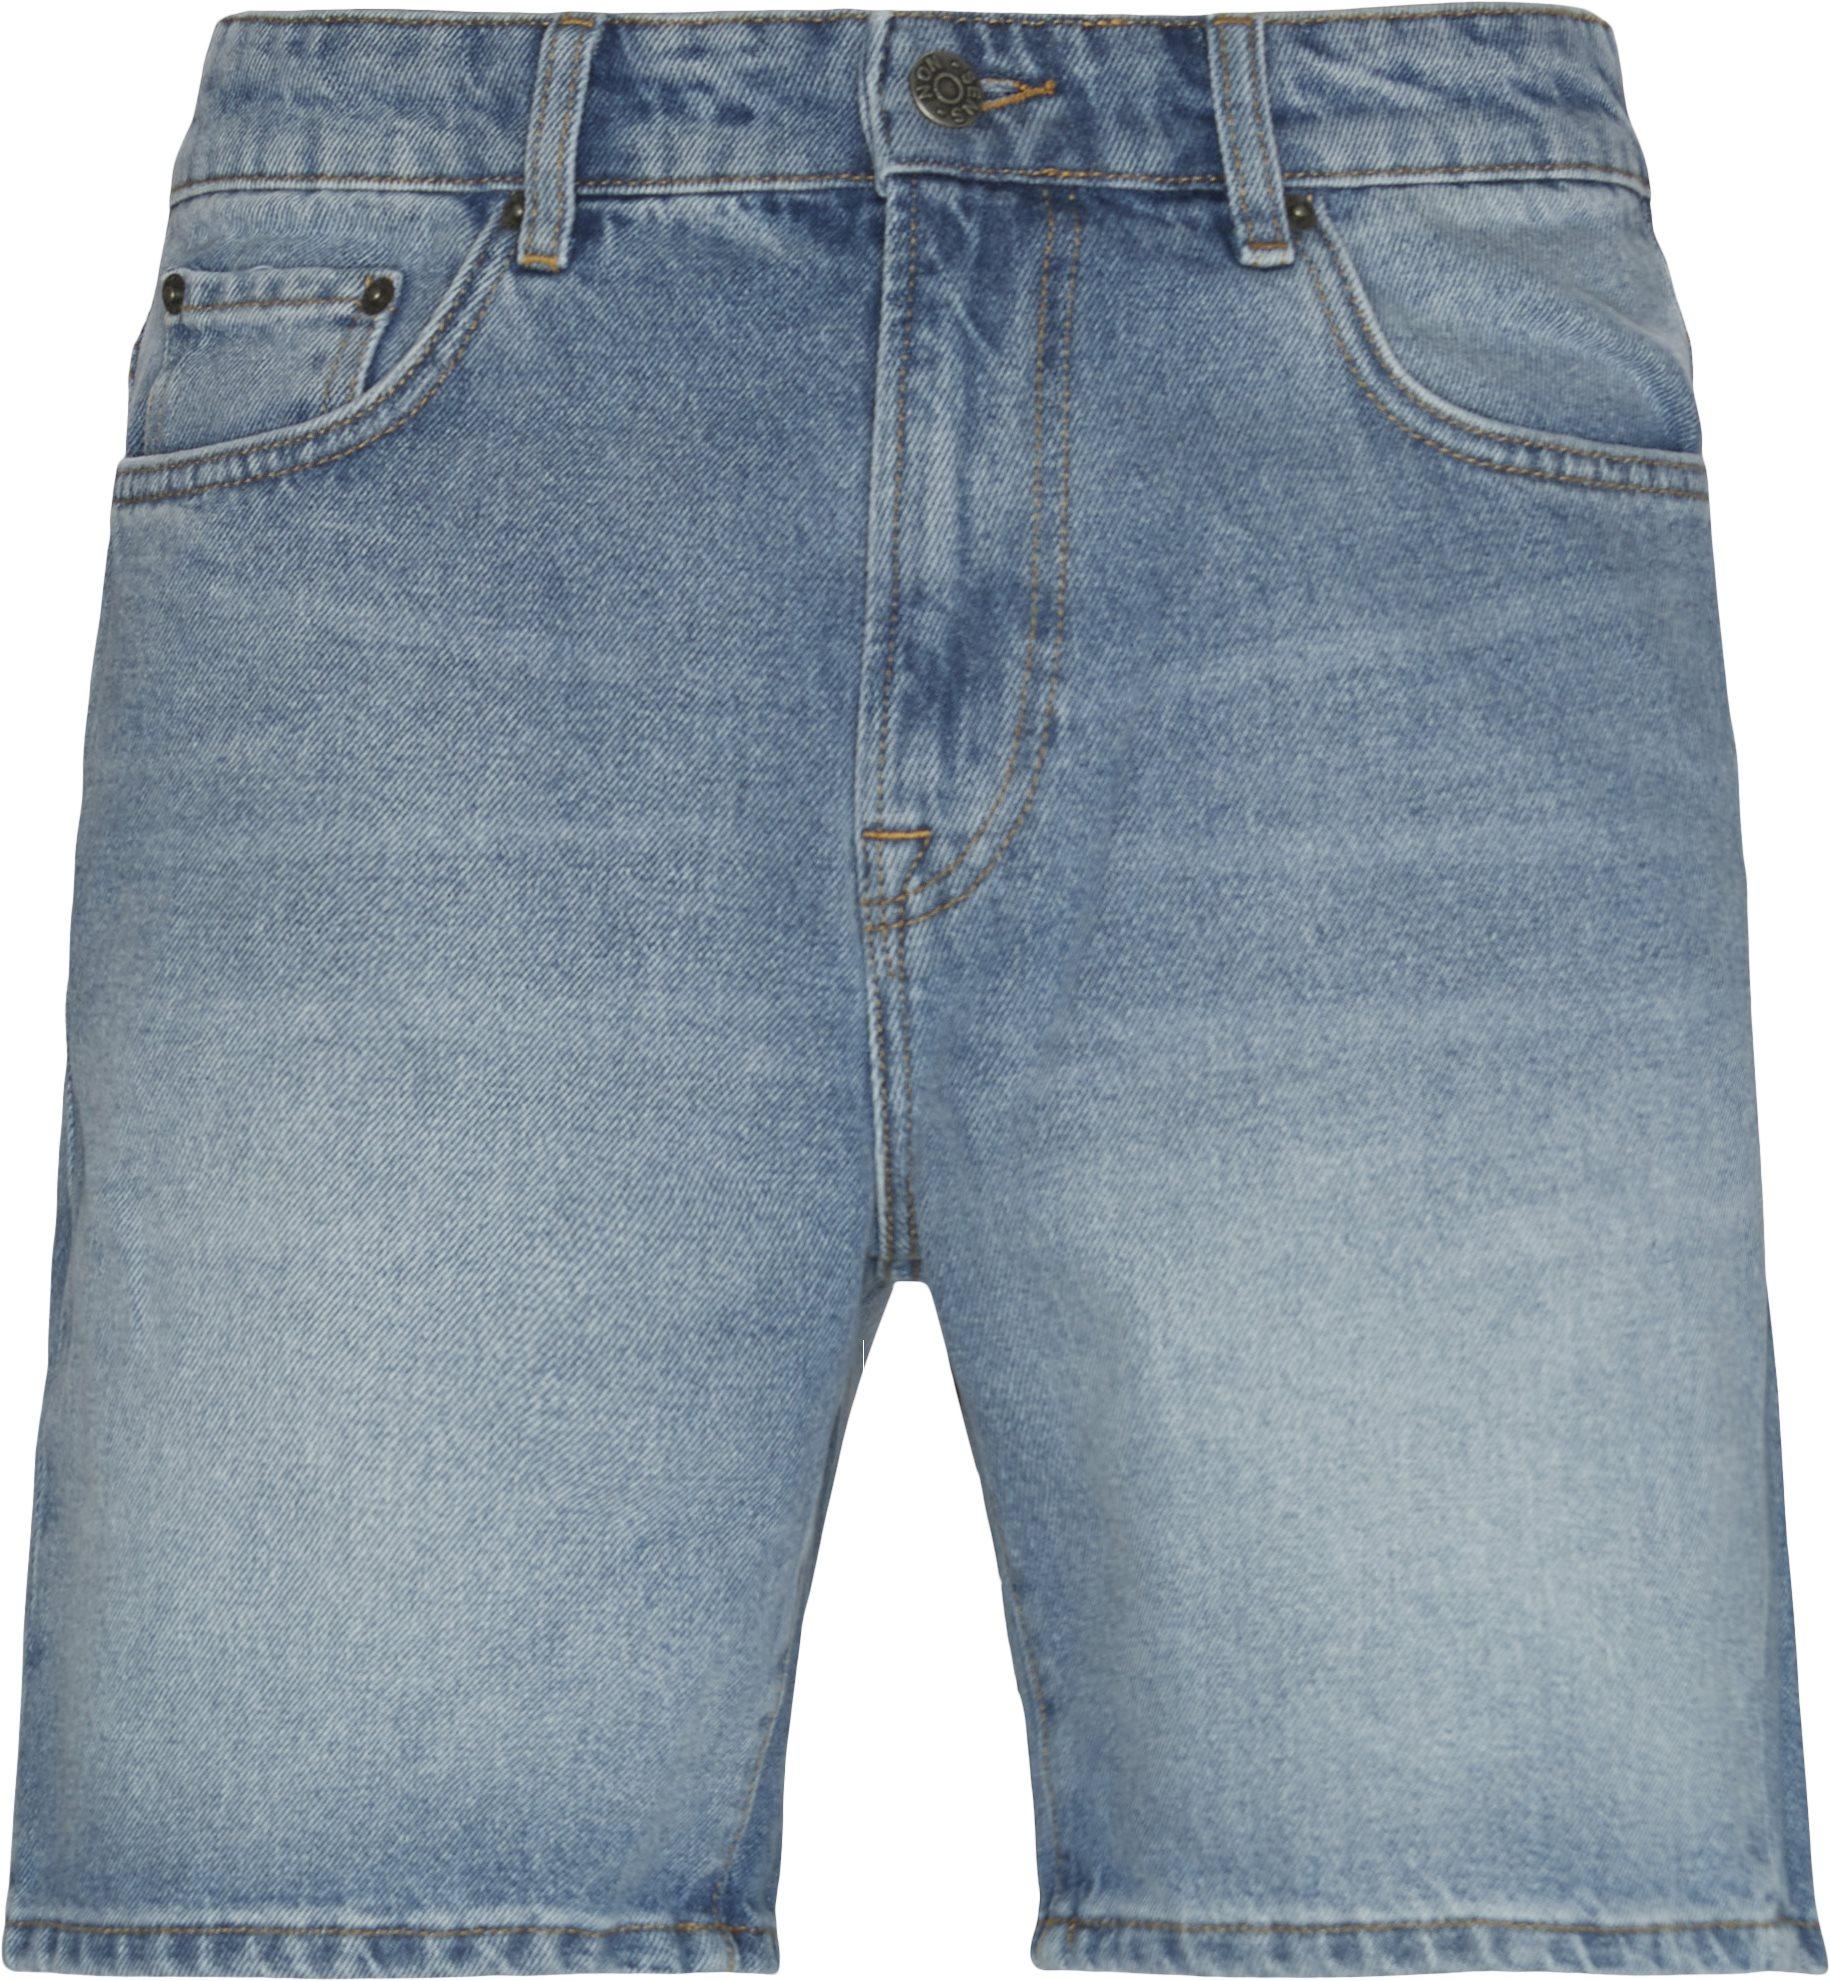 Phoenix Shorts - Shorts - Regular fit - Denim